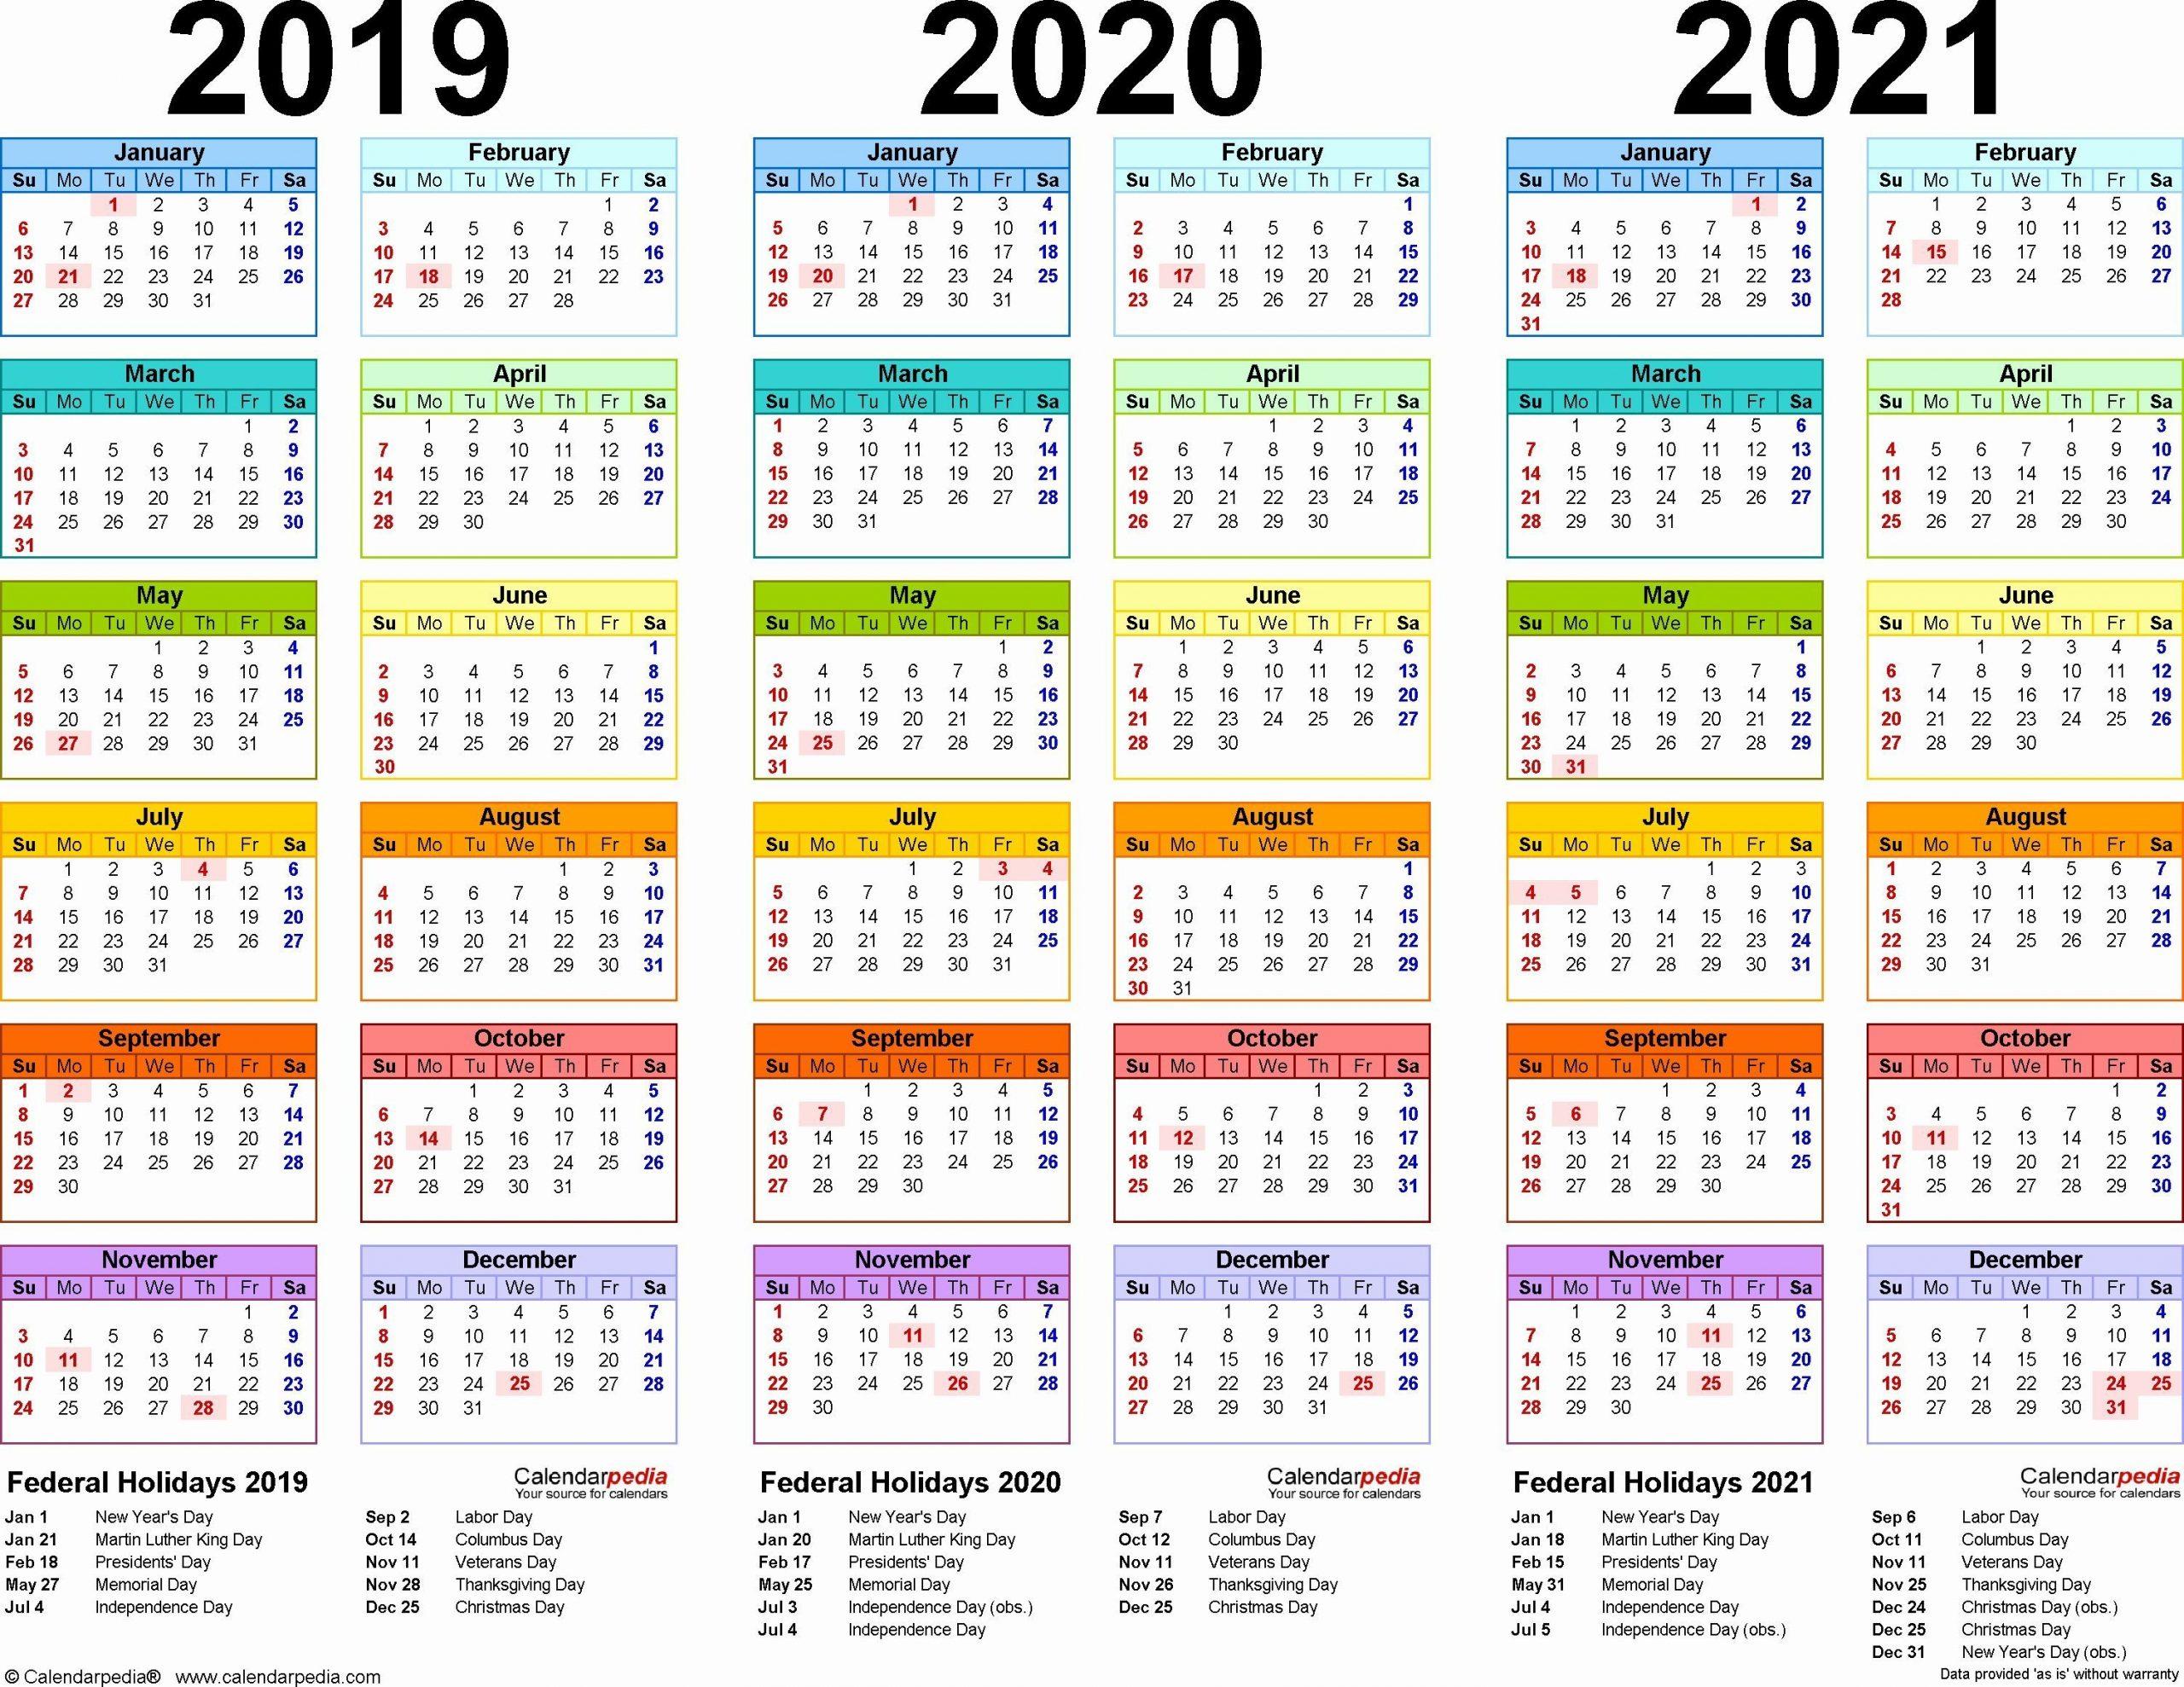 Universal 2021 Bi-Weekly Payroll Calendar | Get Your